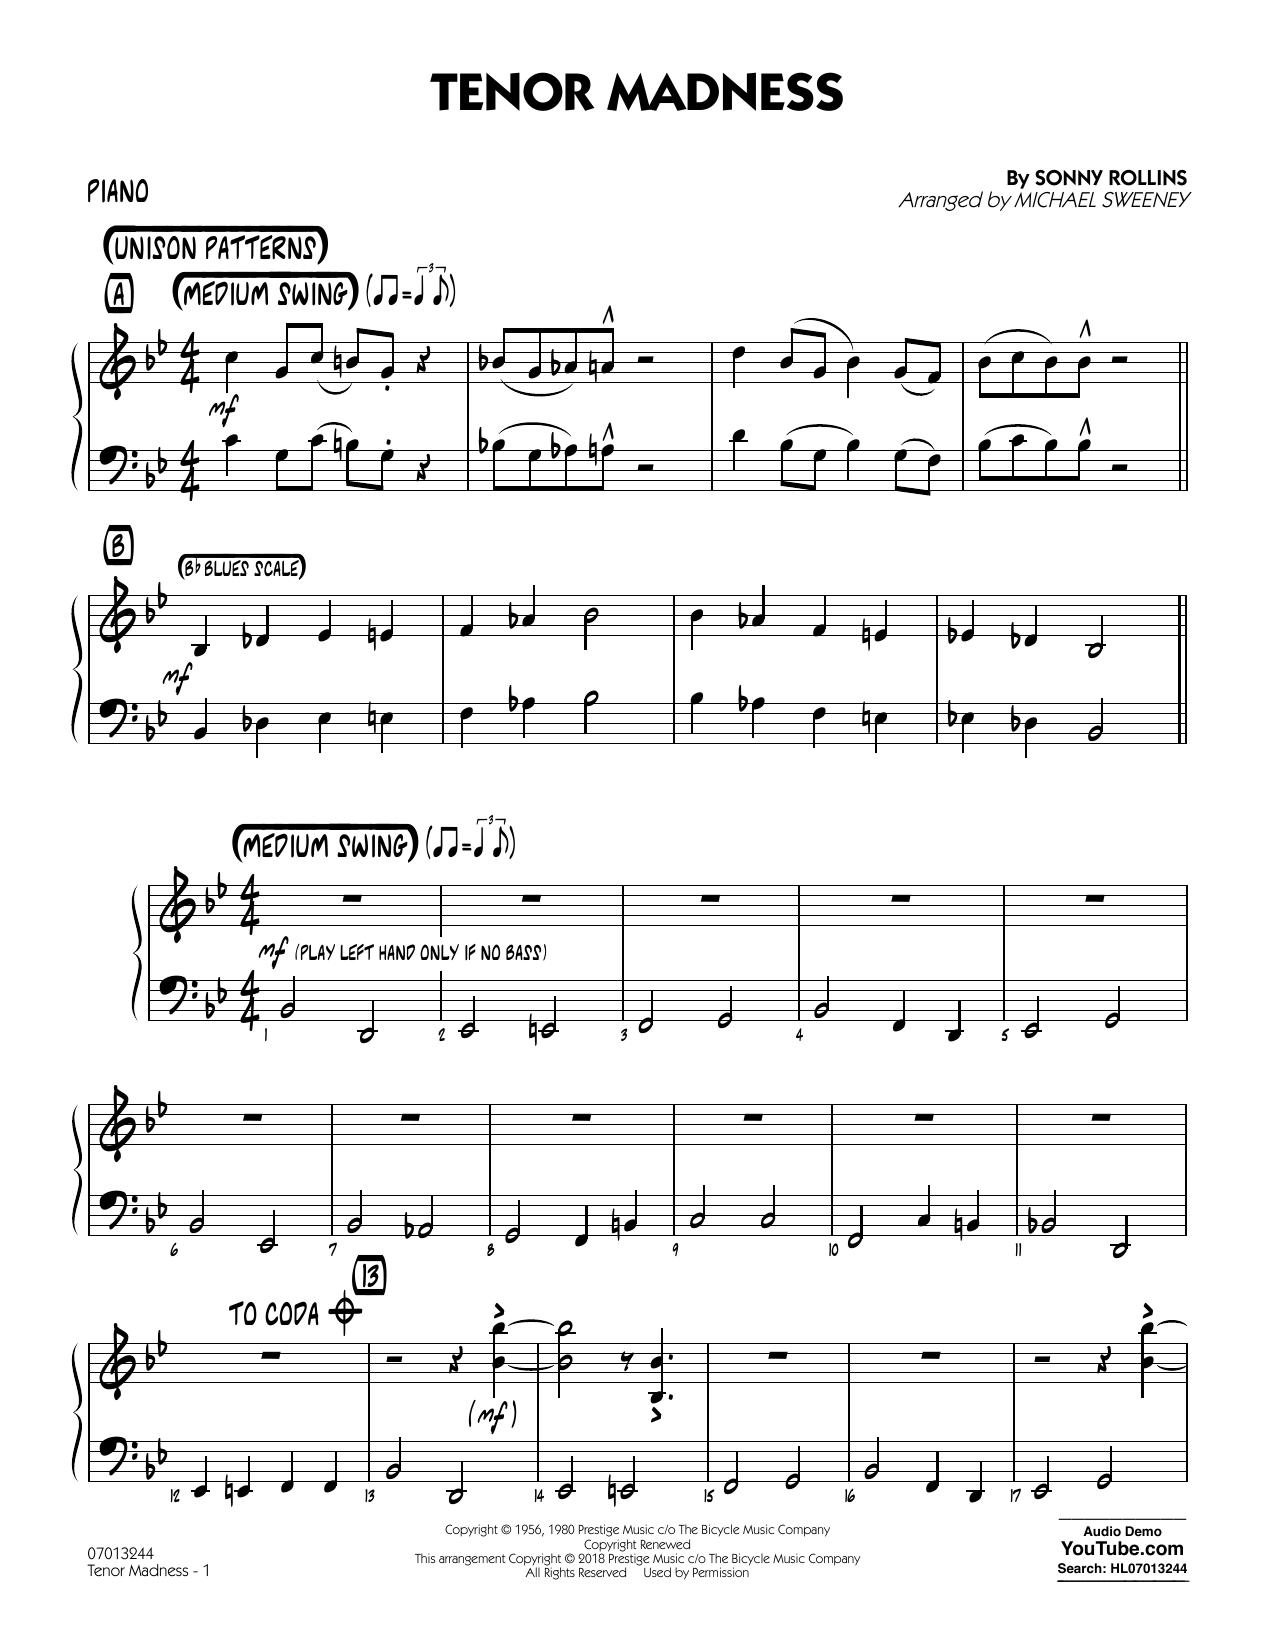 Tenor Madness (arr  Michael Sweeney) - Piano by Sonny Rollins Jazz Ensemble  Digital Sheet Music